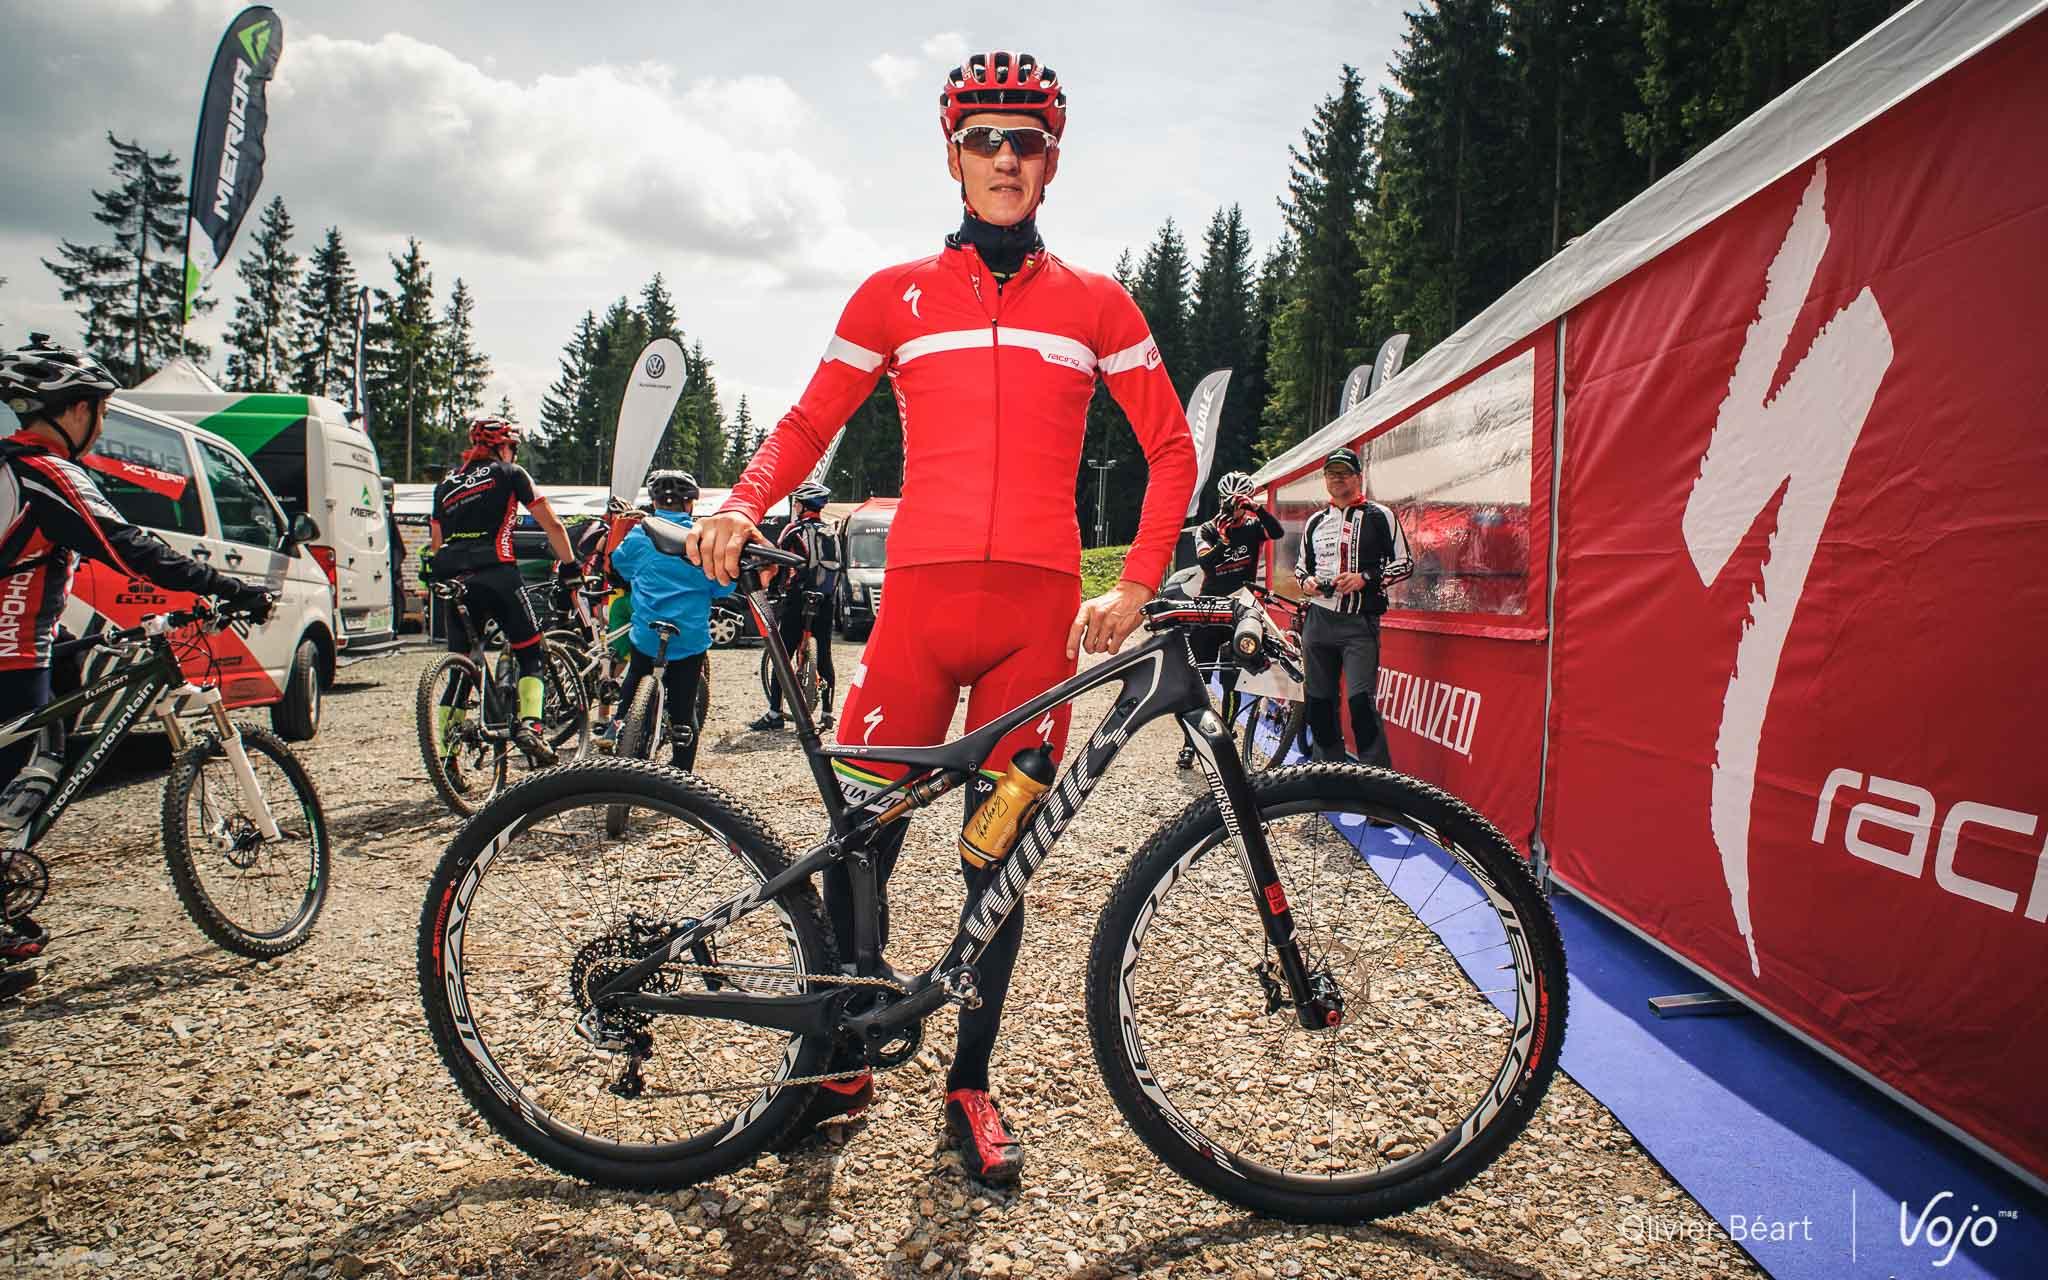 World_Cup_MTB_Pro_Bike_Check_Specialized_Epic_Jaroslav_Kulhavy_Copyright_OBeart_VojoMag-1